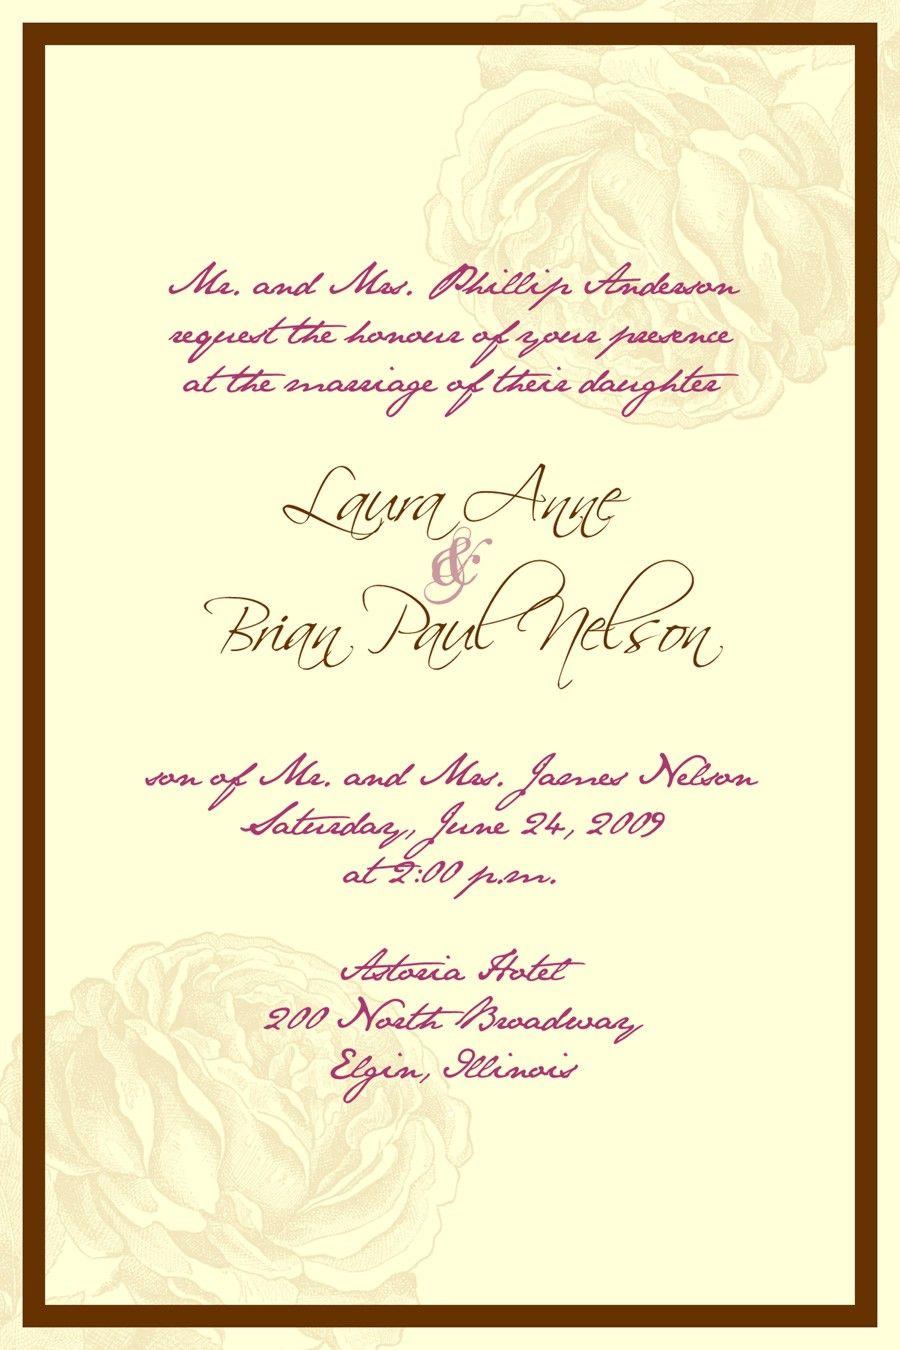 wedding invitation wording Google Search 4/12/14